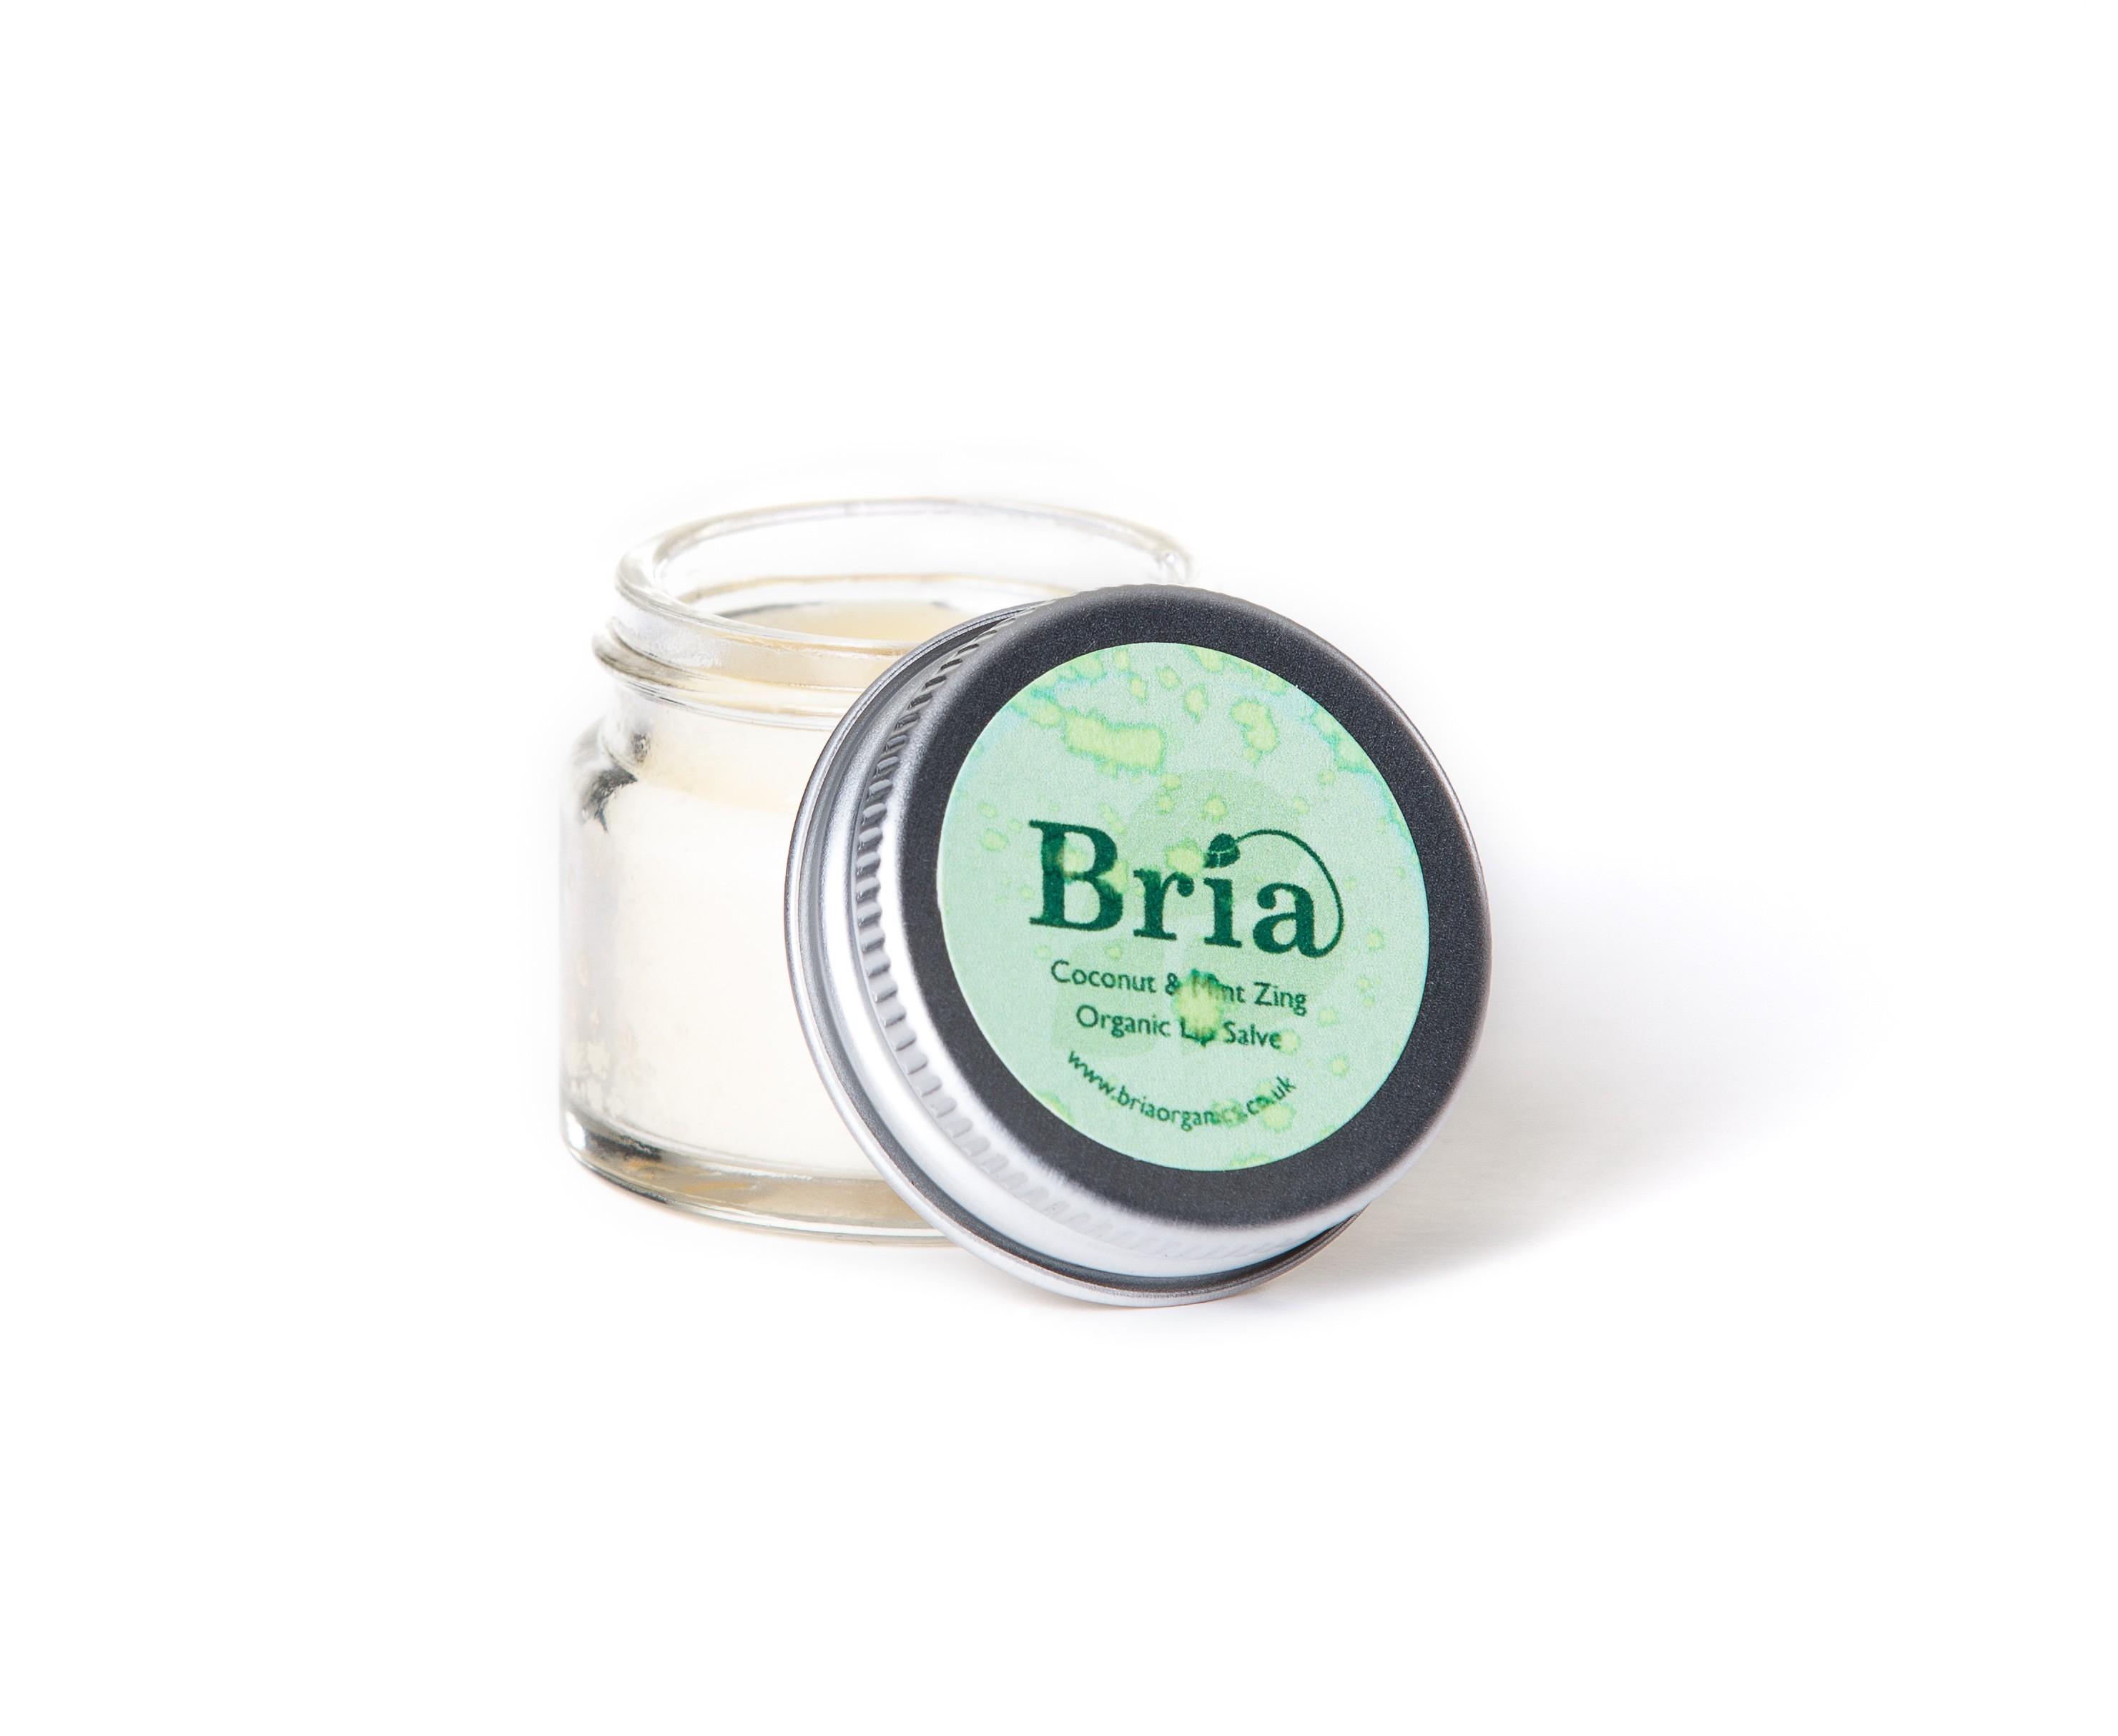 Bria Organics - Mint & Coconut Lip Balm